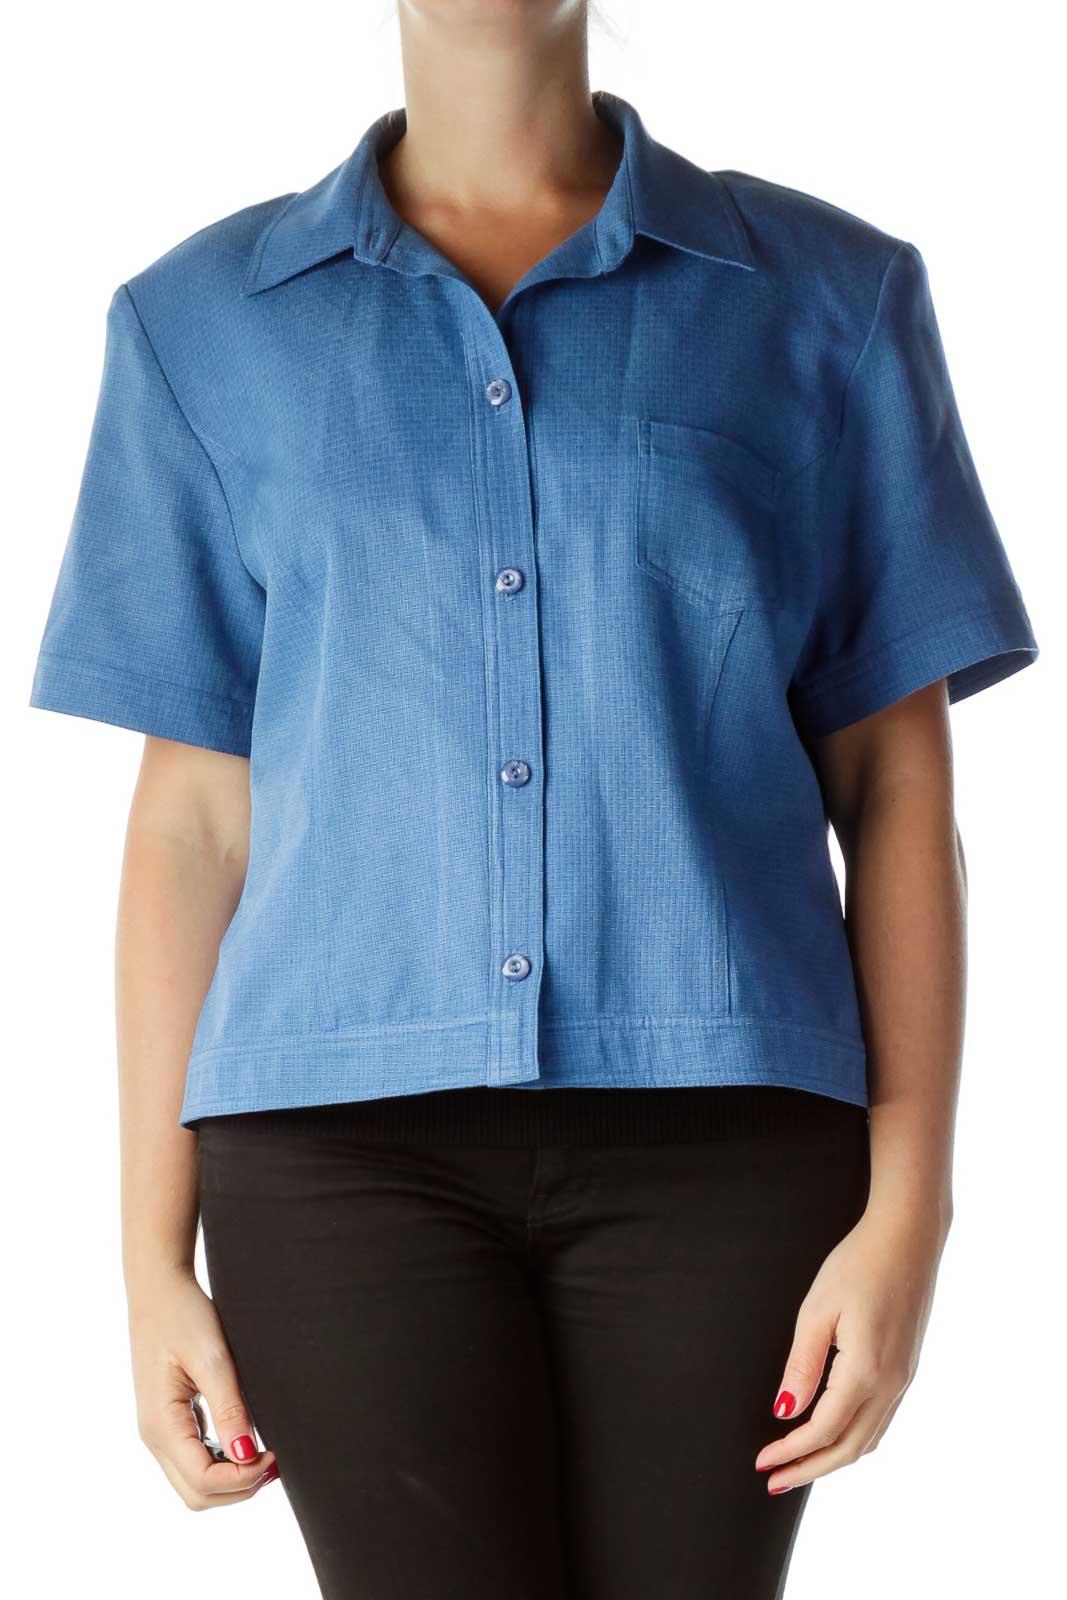 Blue Short Sleeve Suit Jacket Front